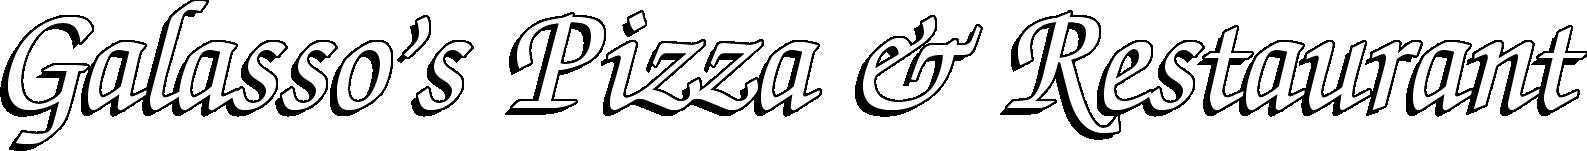 Galasso's Pizza & Restaurant | 48 Bridge St., Frenchtown, NJ | (908) 996-2511